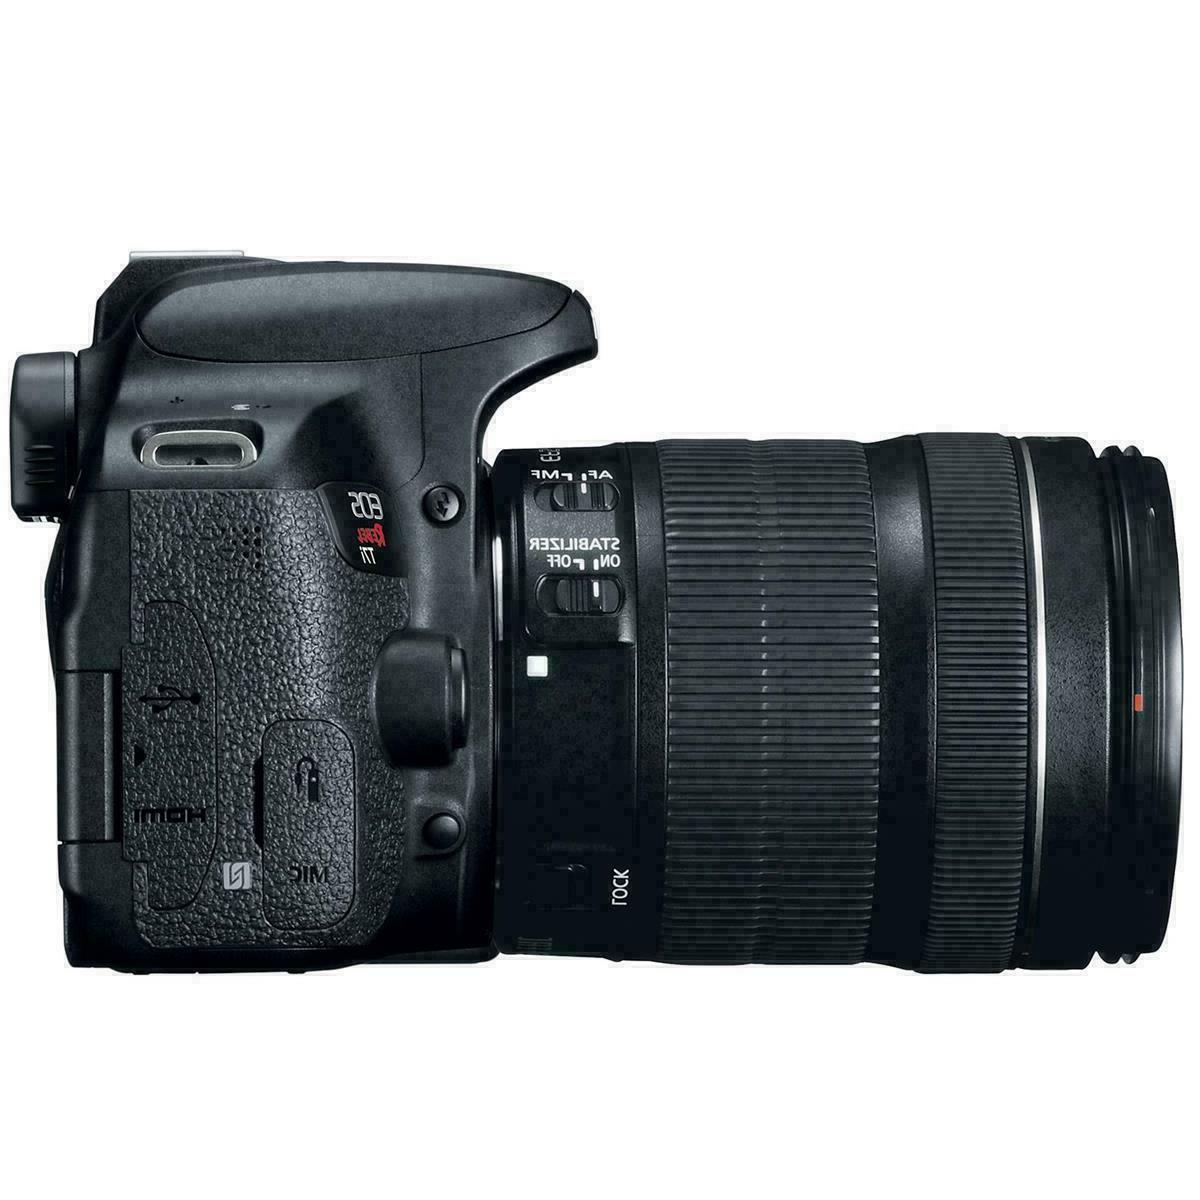 Canon Rebel T7i 24MP DSLR IS STM Kit-HD-WiFi/NFC-NIB